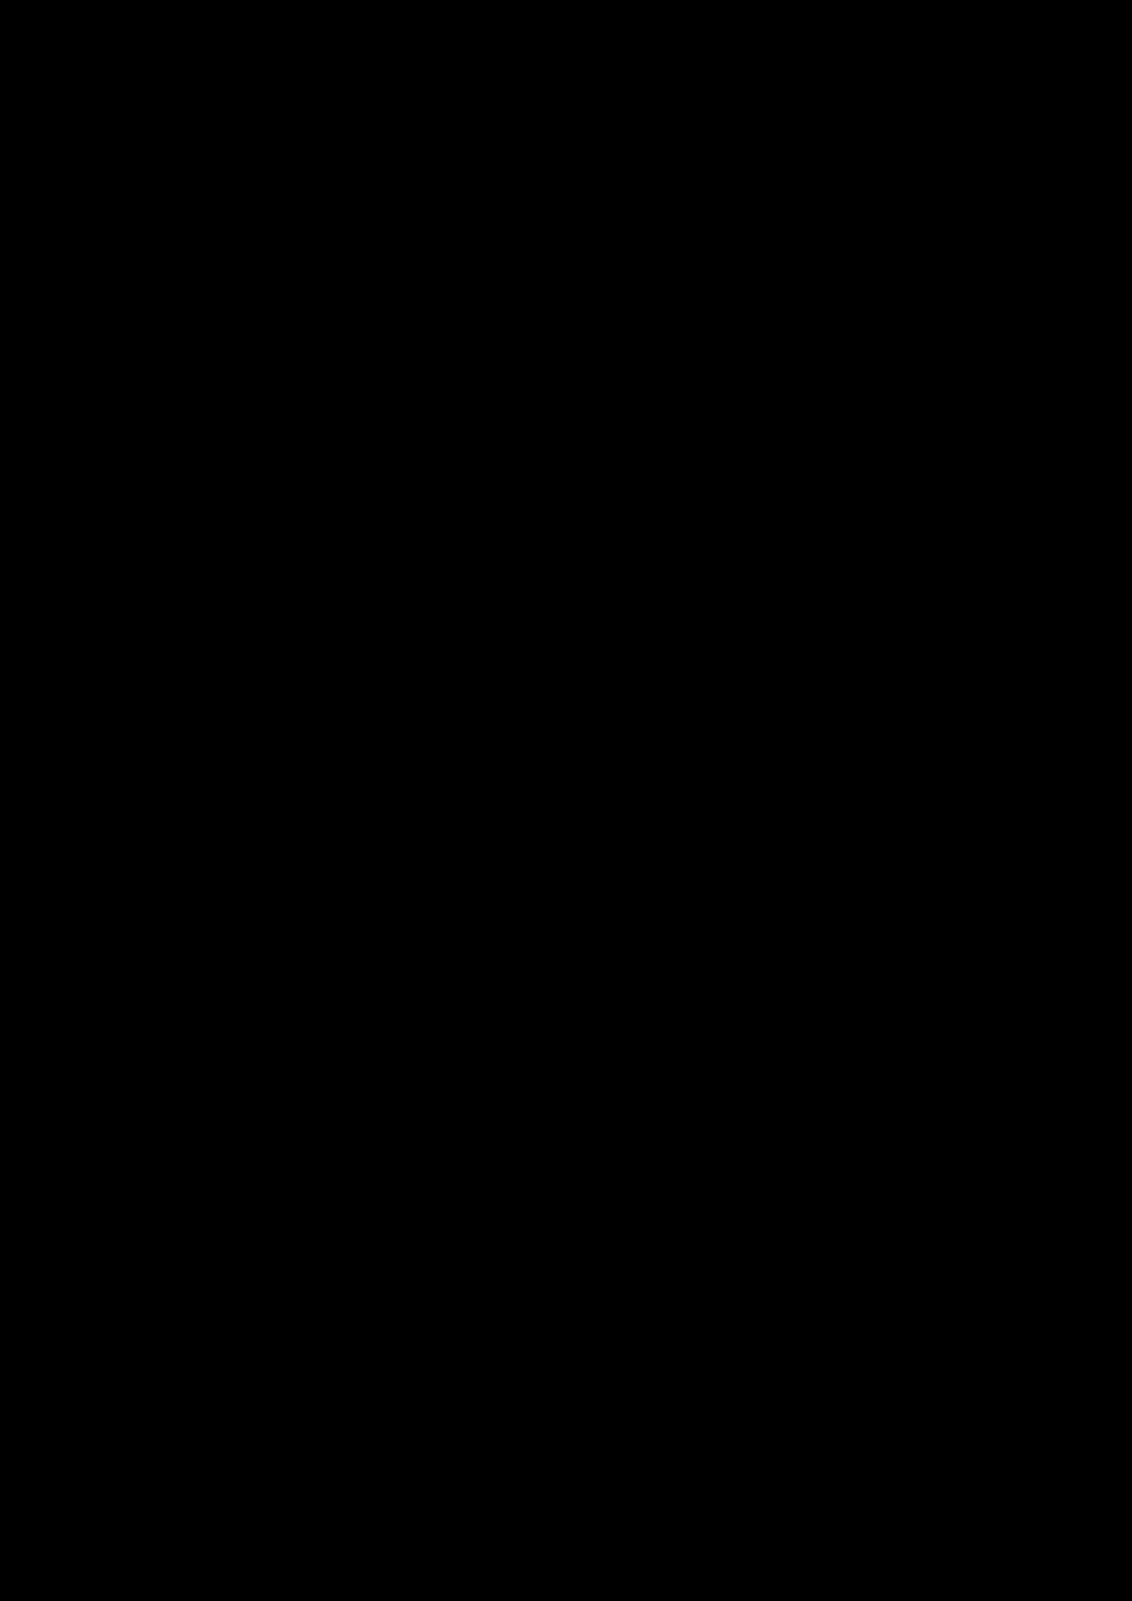 Mrs. Vandebilt slide, Image 24